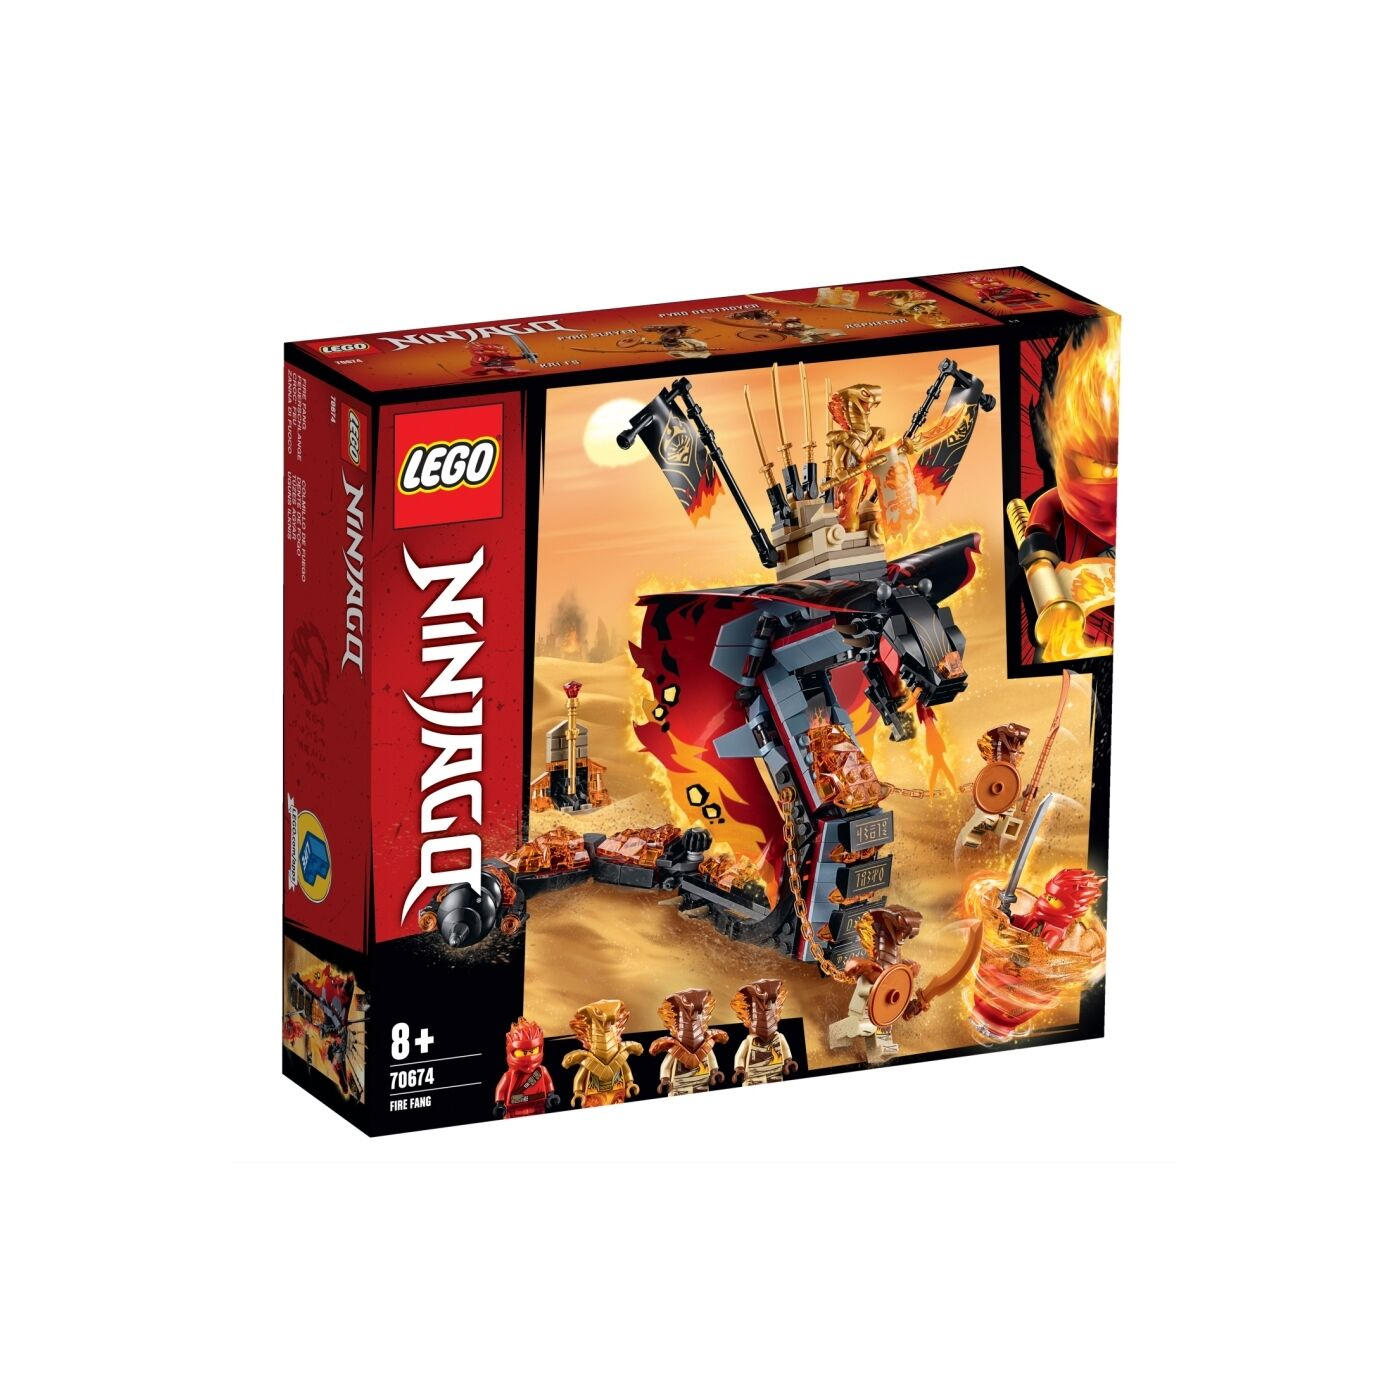 Lego Ninjago Tüzes agyar